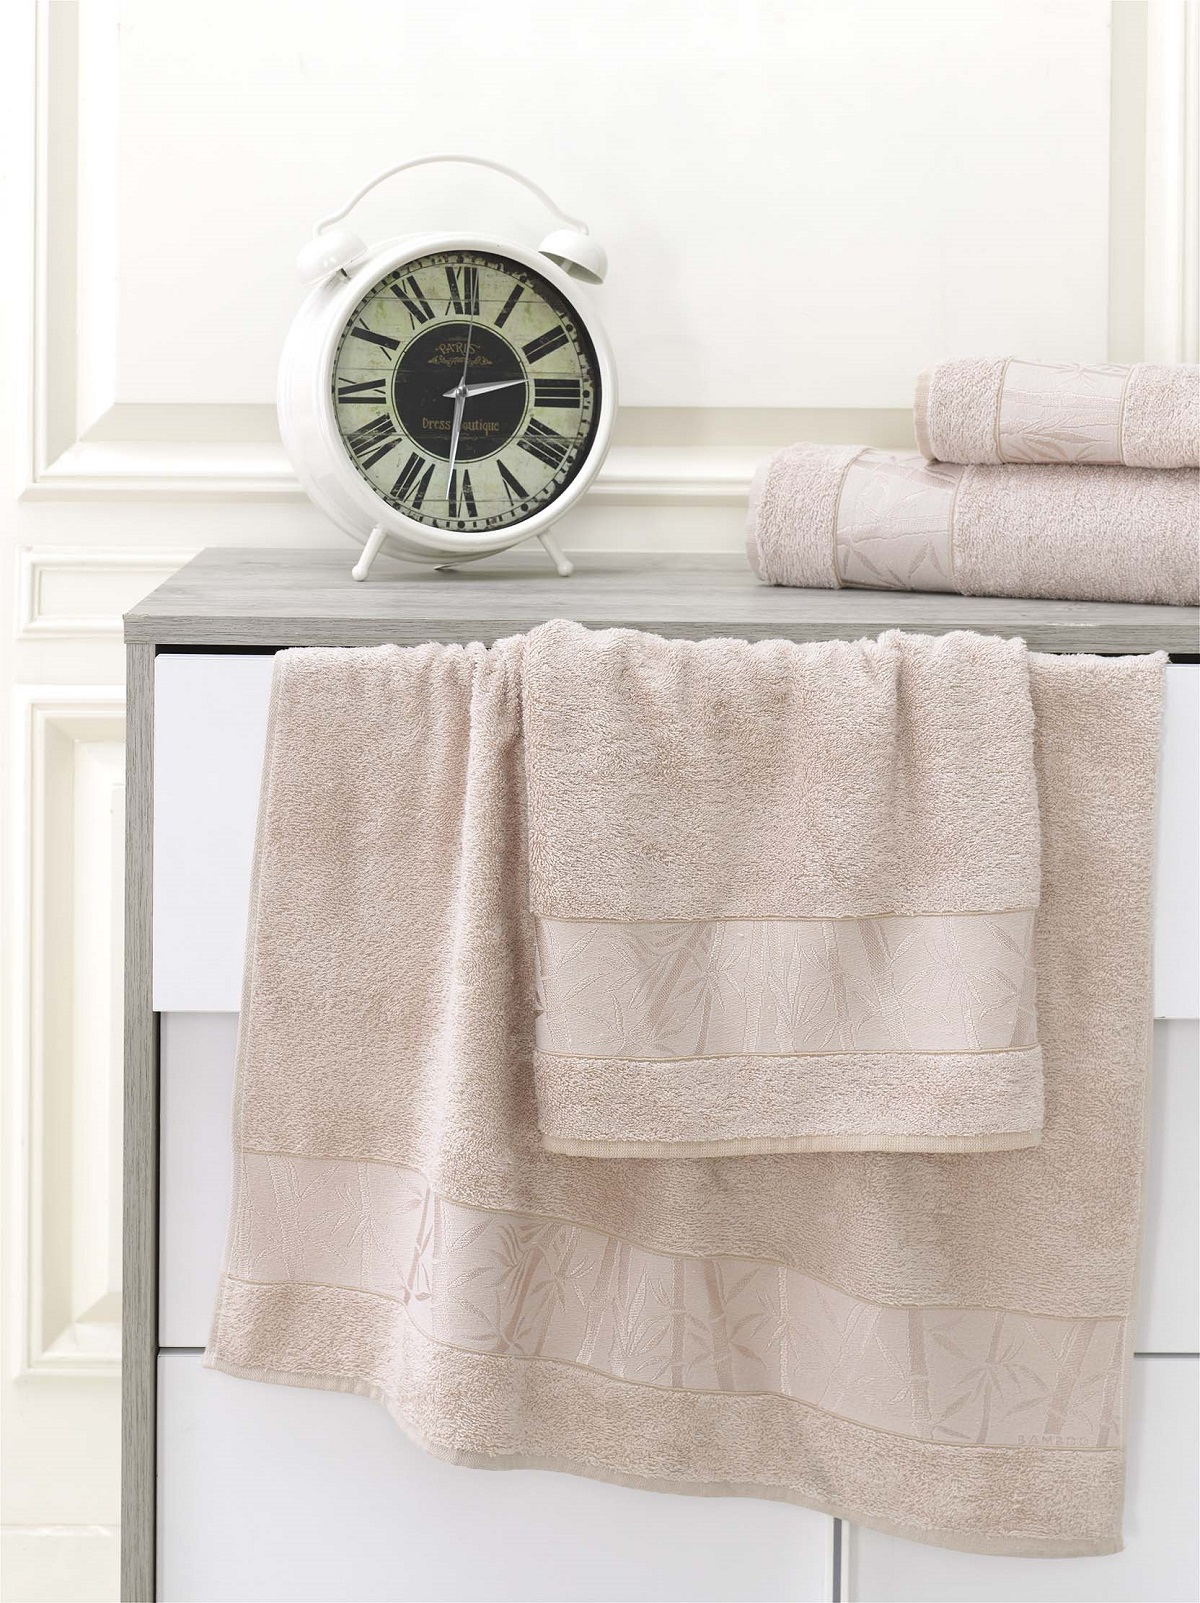 Полотенца Karna Полотенце Pamira Цвет: Бежевый (70х140 см) полотенца karna полотенце iteka цвет коричневый 70х140 см